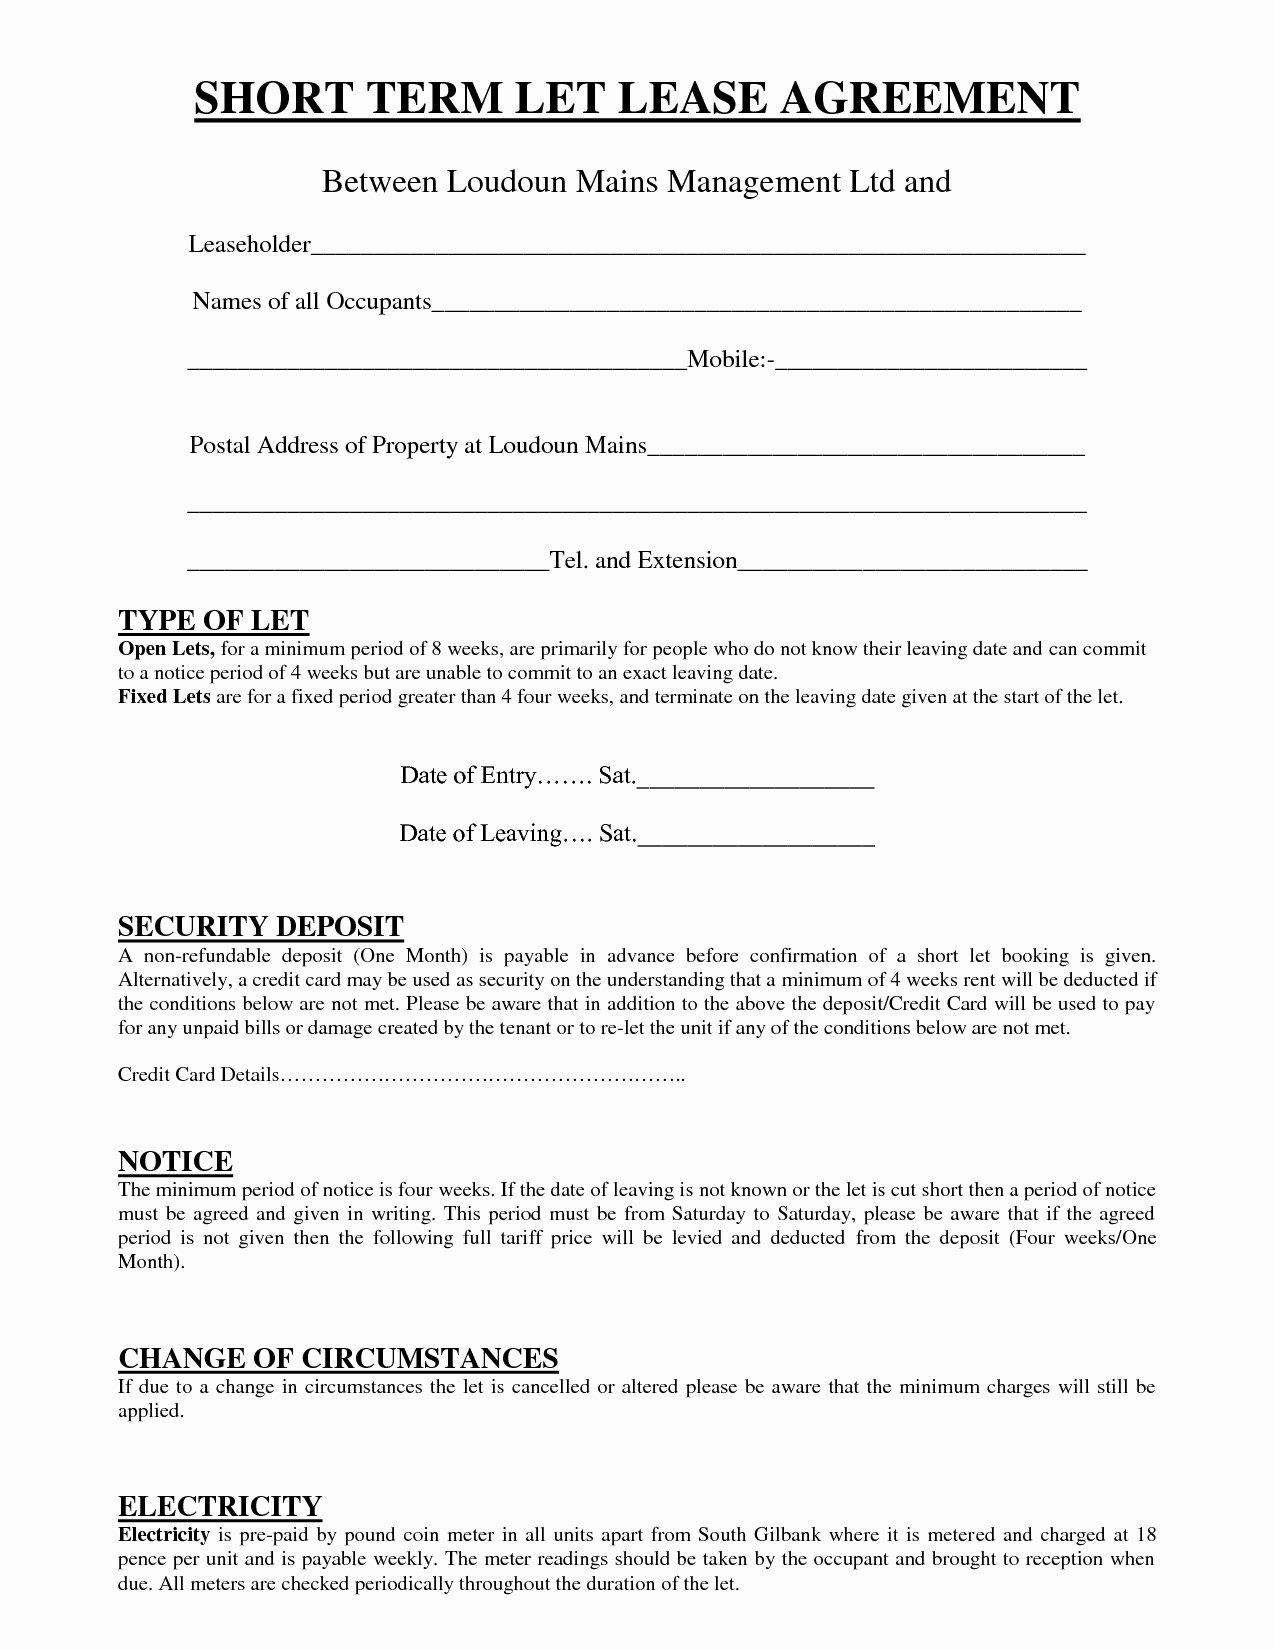 Short Term Rental Agreement Template Beautiful Free Short Term Rental Agreement Simple 10 Best Simple